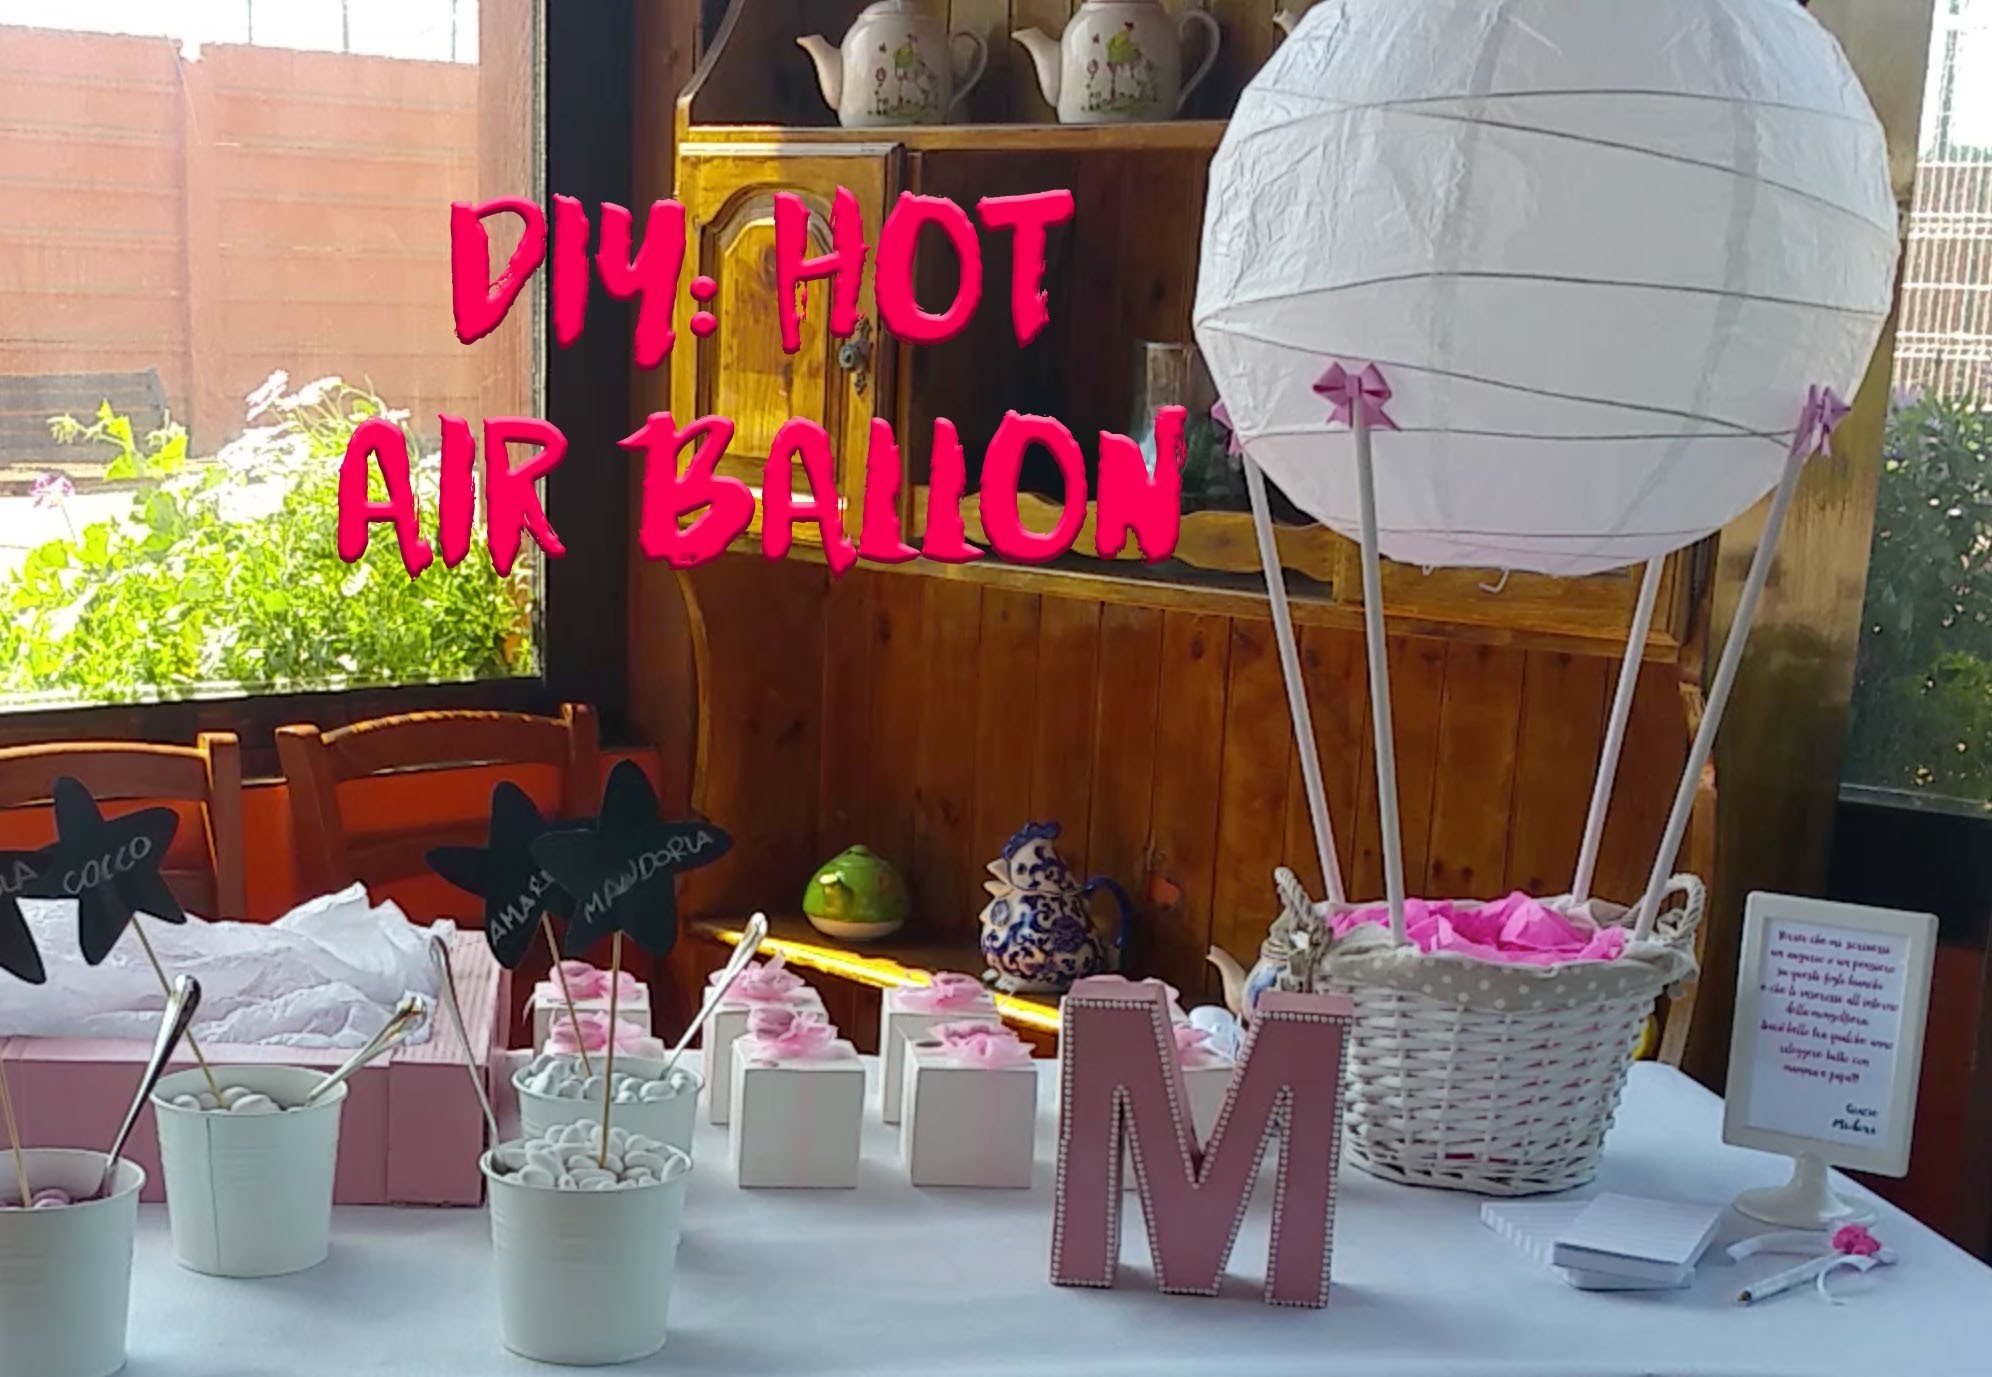 Diy: hot air ballon with ikea lamp.Diy: mongolfiera con lampada ikea